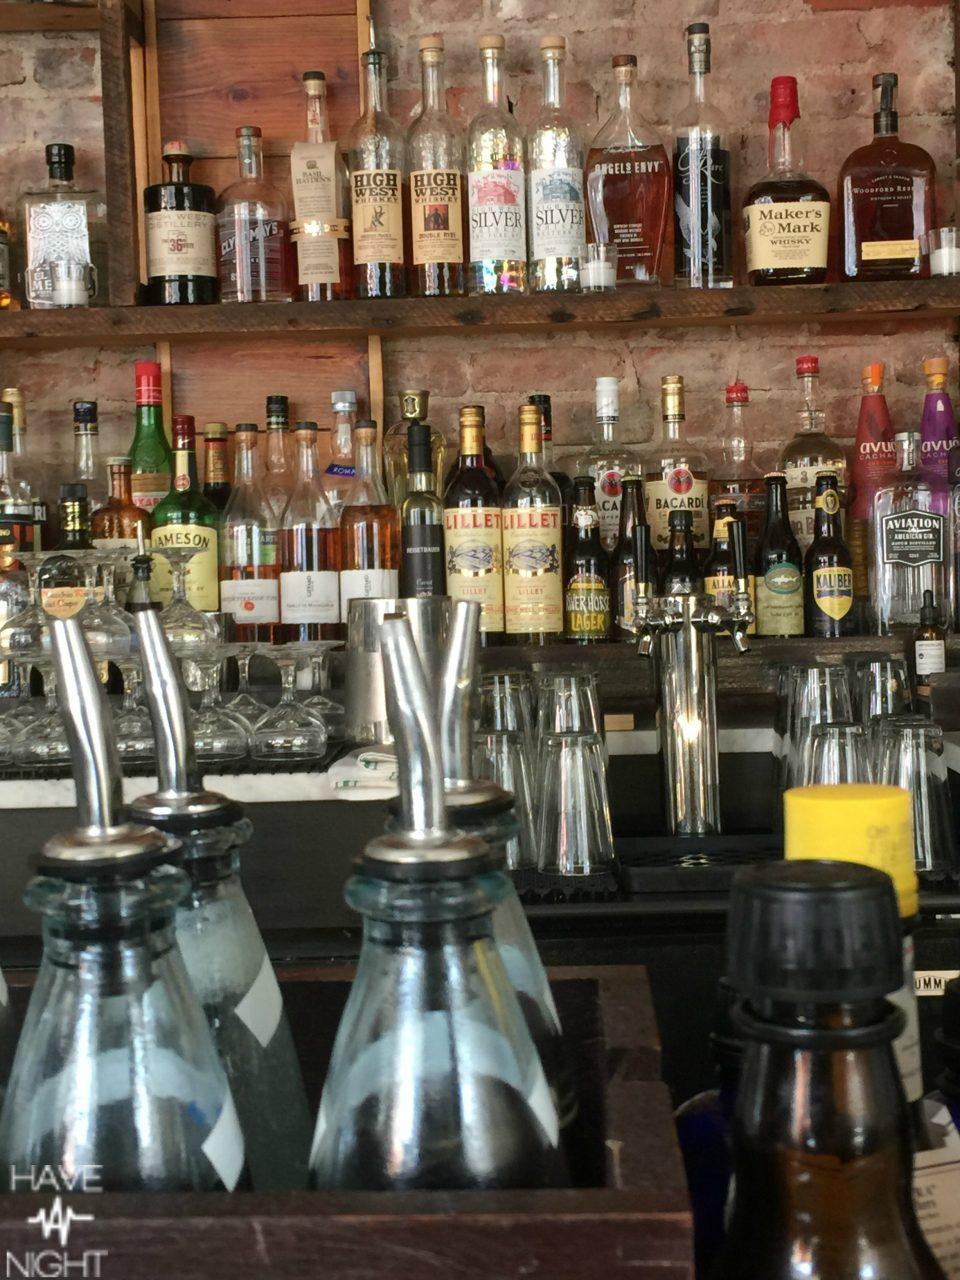 Jersey City Weekly Happy Hour Specials: 7/18-7/24